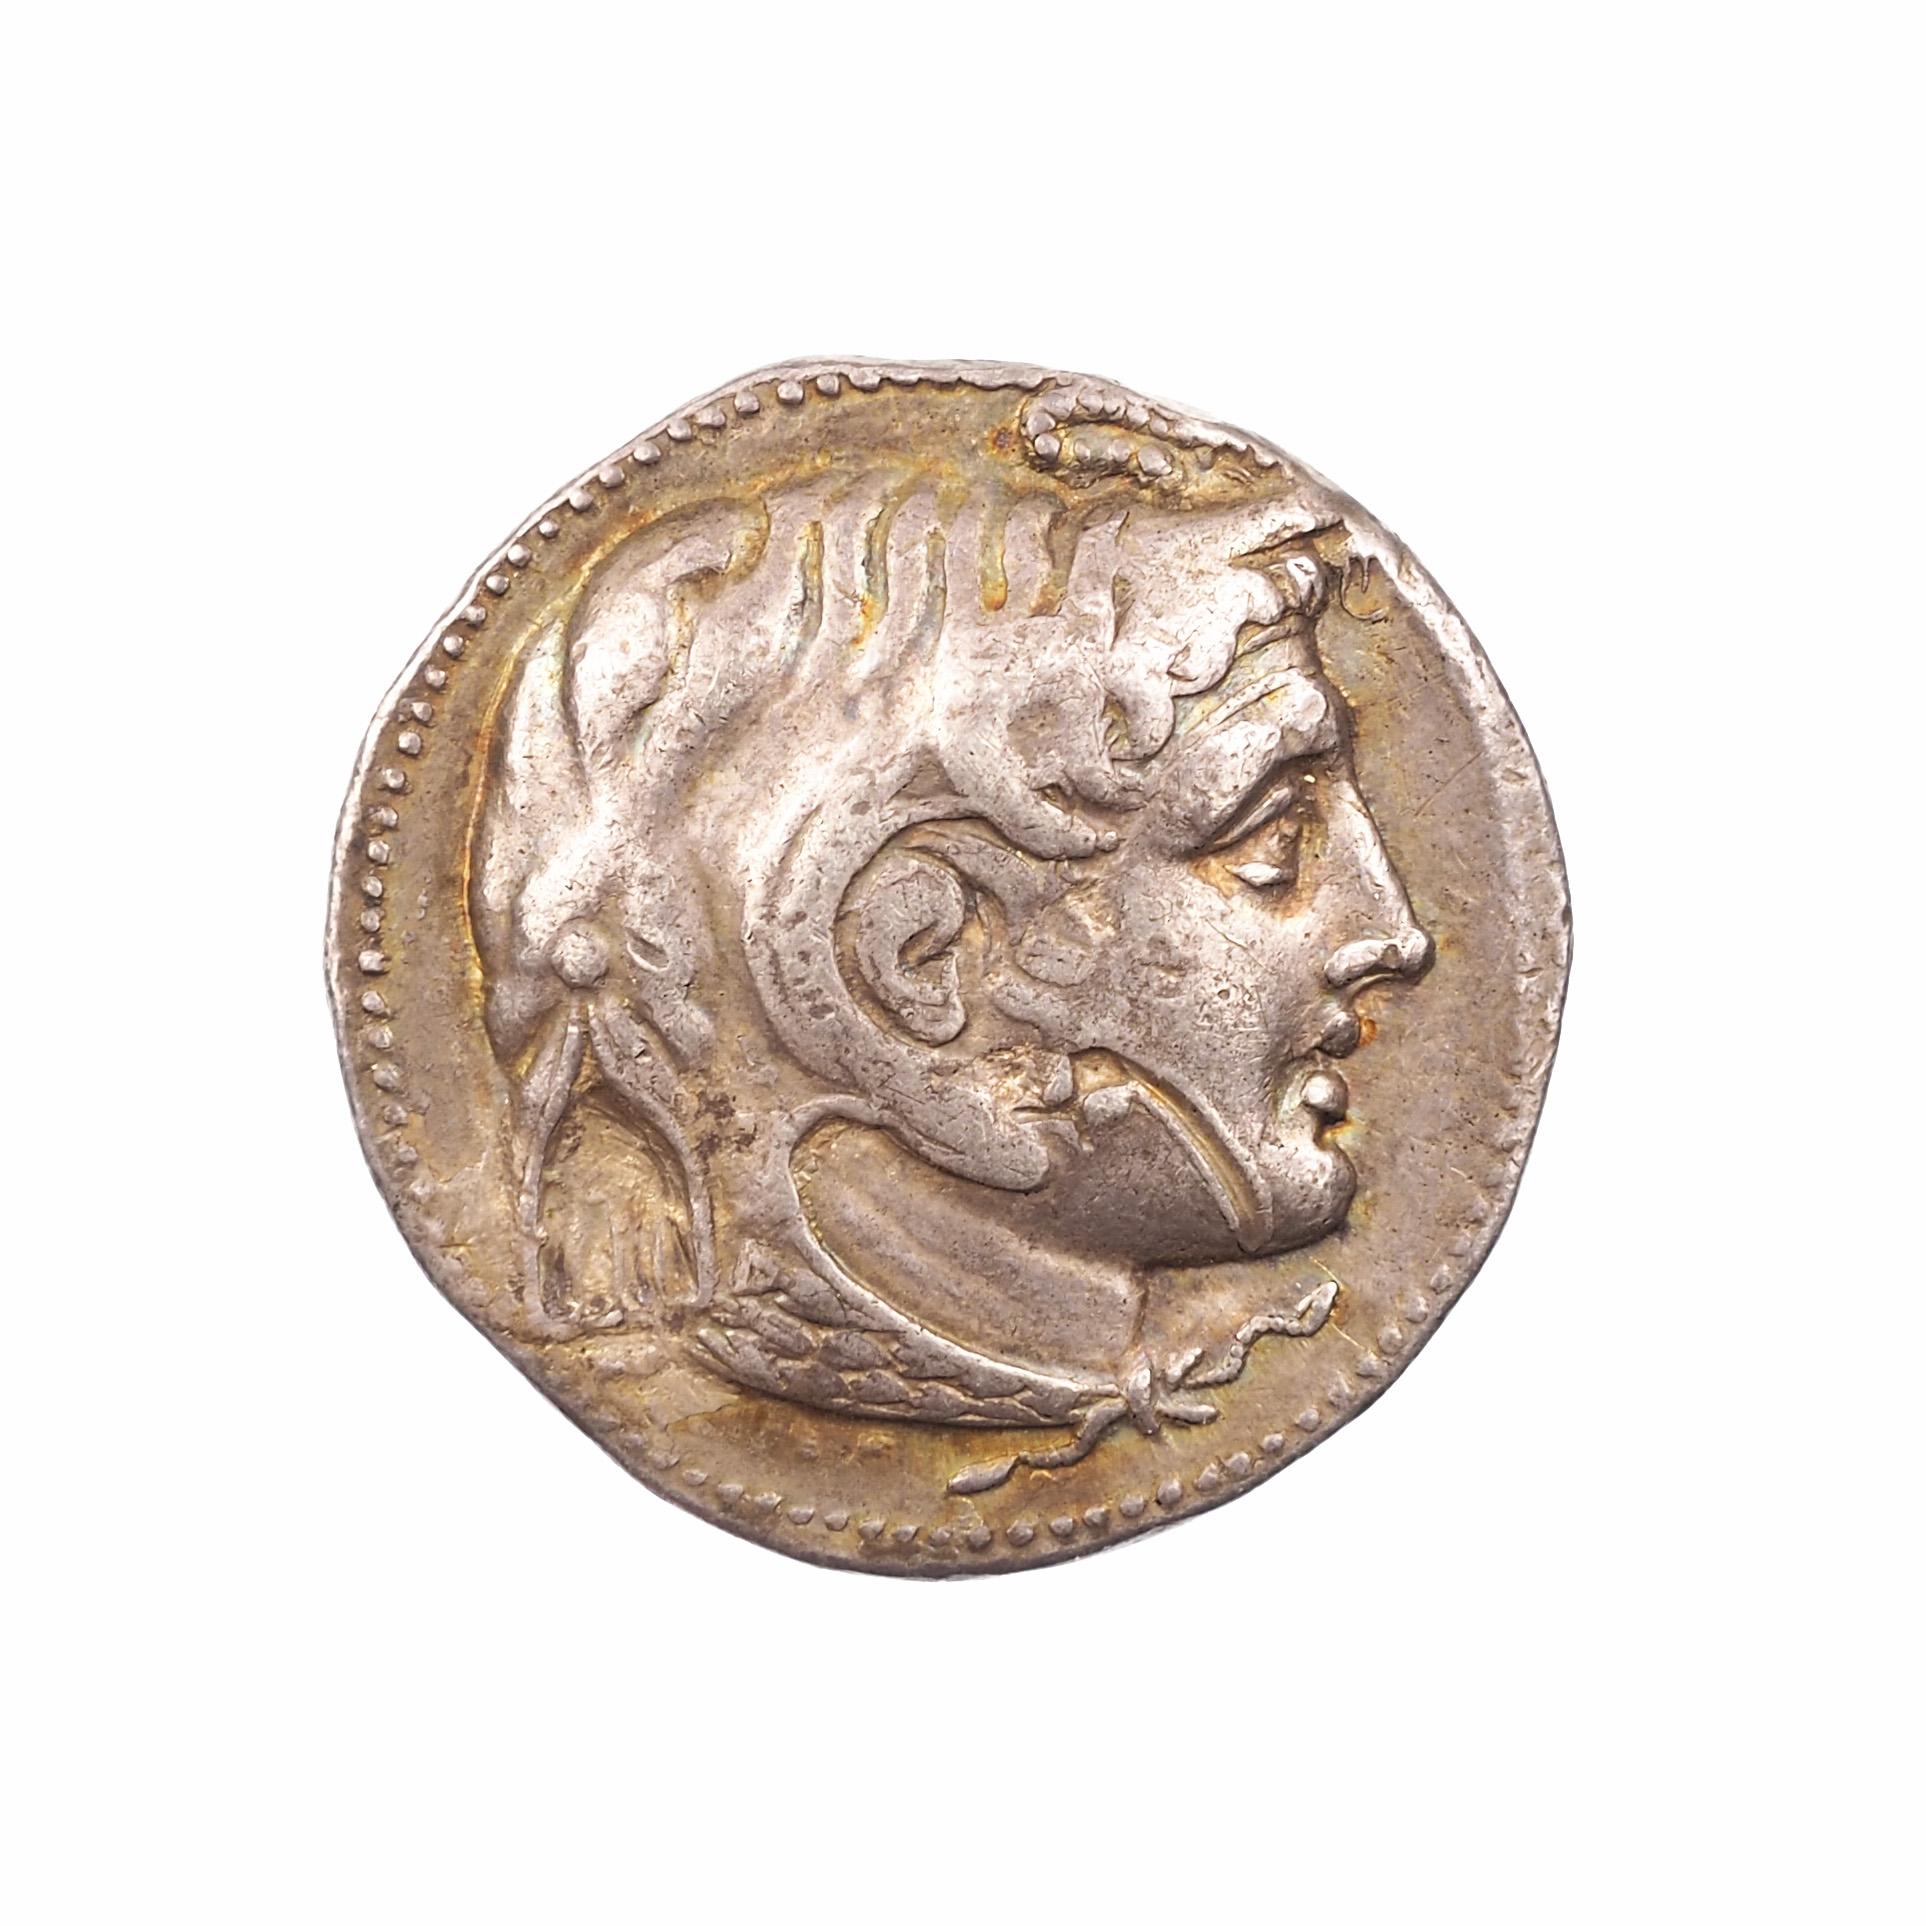 Ptolémée Ier Soter, Tétradrachme, Alexandrie, 323-305 BC, Svoronos 110, RARE !!!